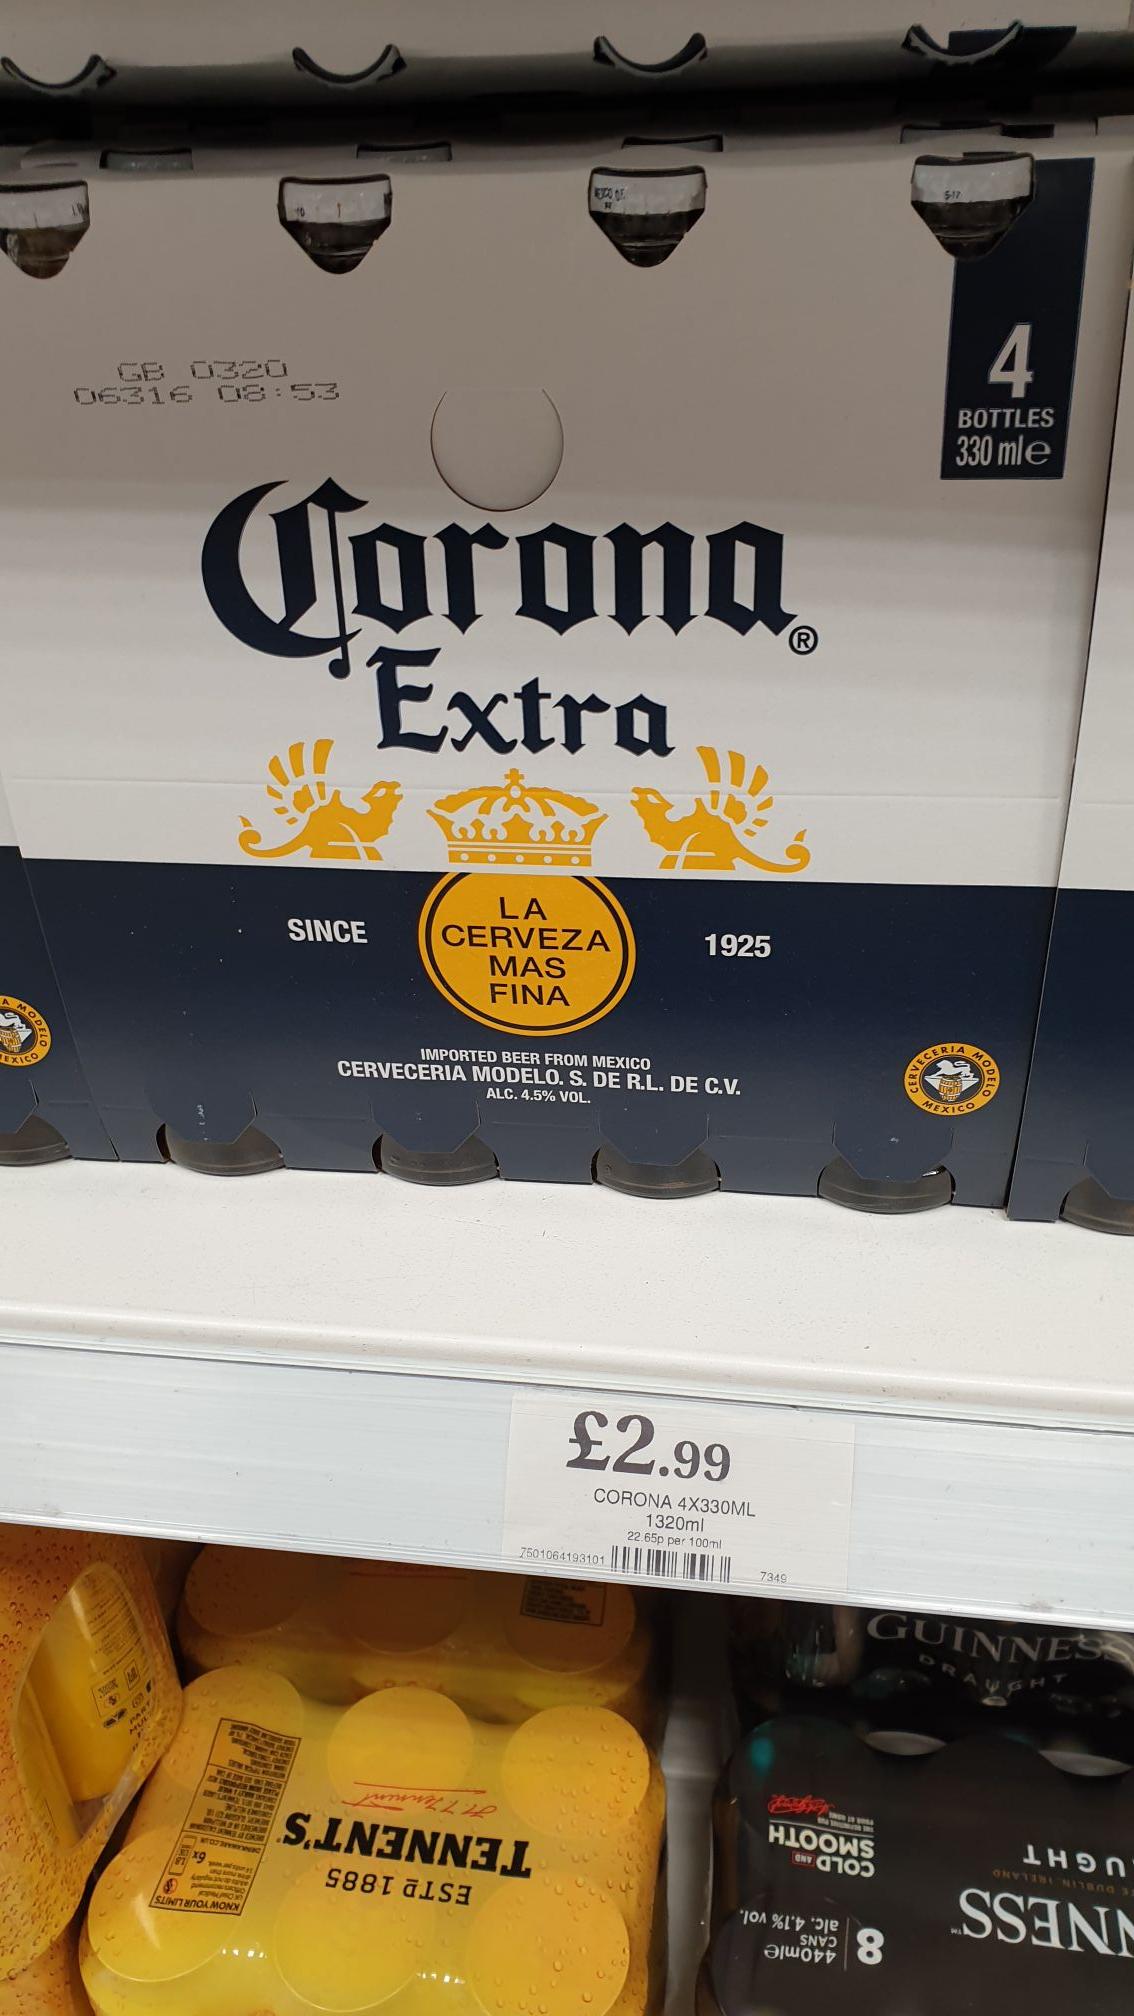 Corona 330ml 4pk £2.99 at Home Bargains Peterhead, Aberdeenshire, Scotland